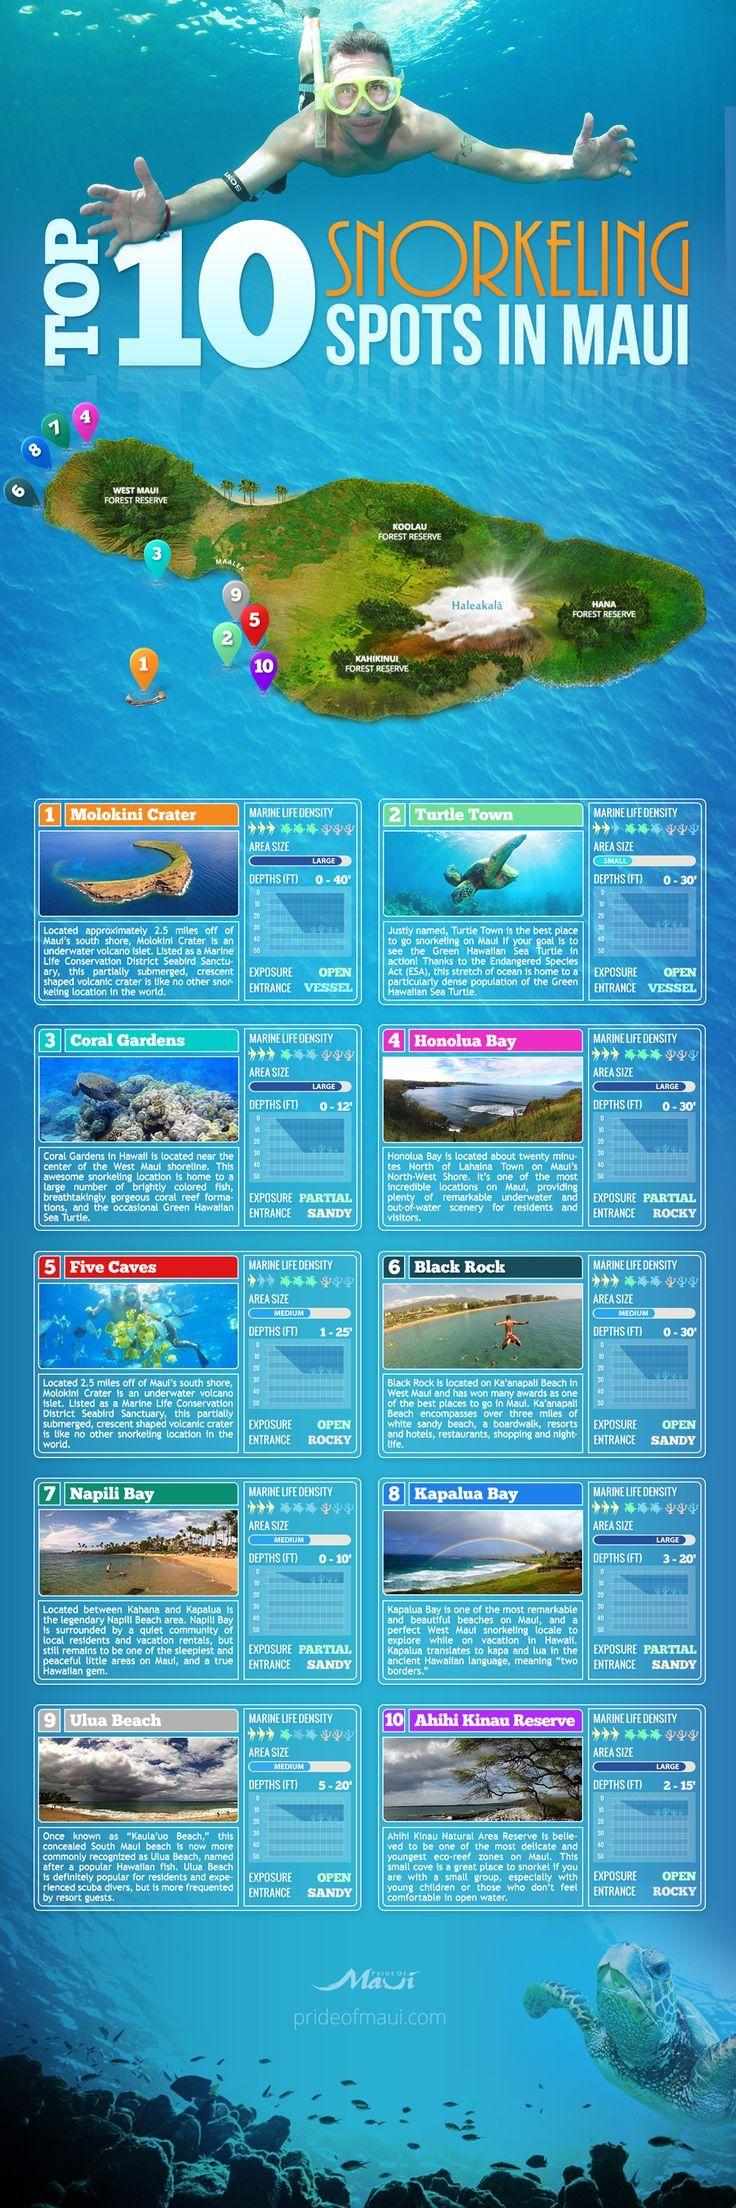 Top 10 Maui snorkeling spots guide More